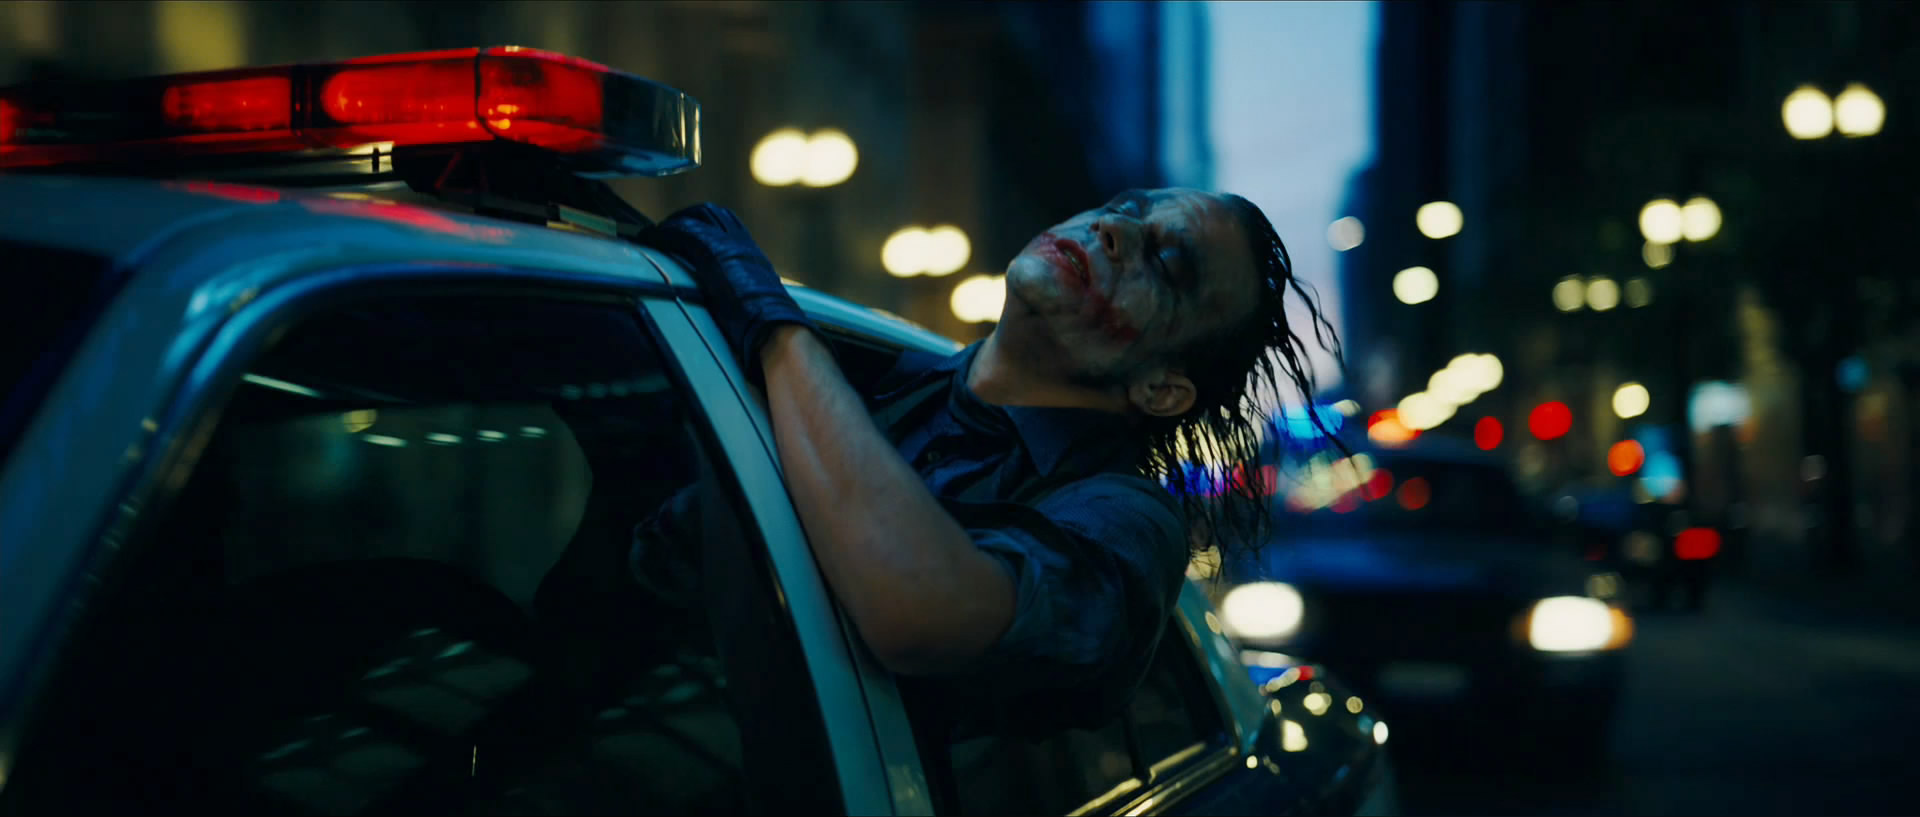 Heath Ledger Joker Car wallpaper 27847 1920x817